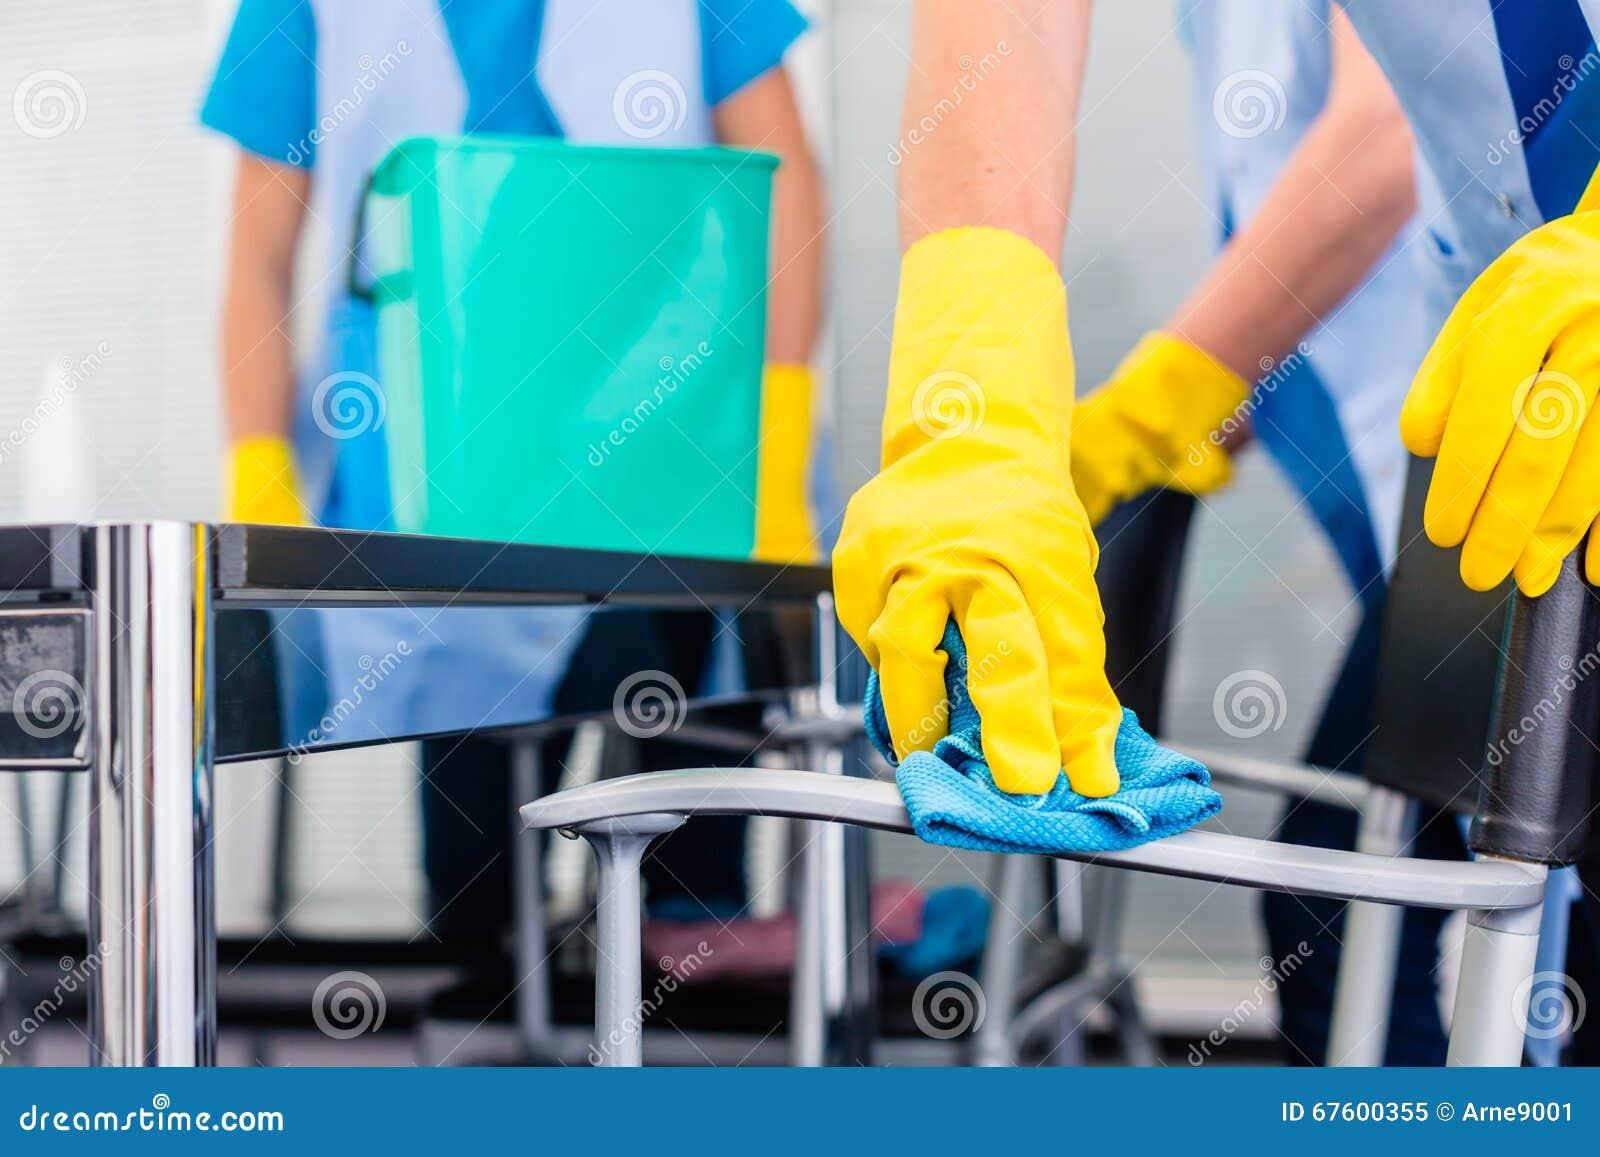 Cleaning ladies working as team in office